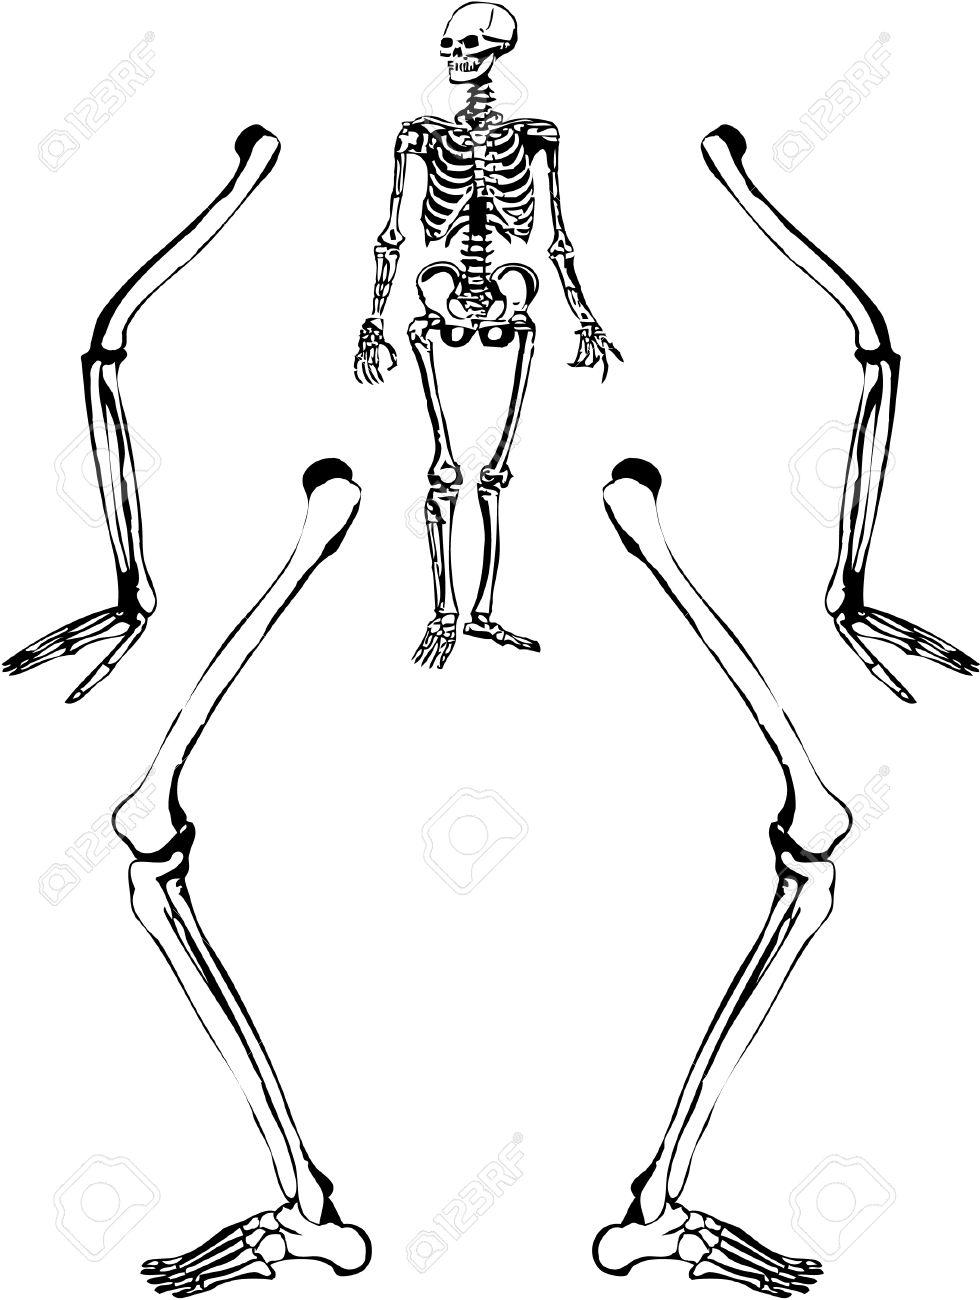 980x1300 Sketch Like Illustration Of A Human Skeleton. Vector 8. Royalty